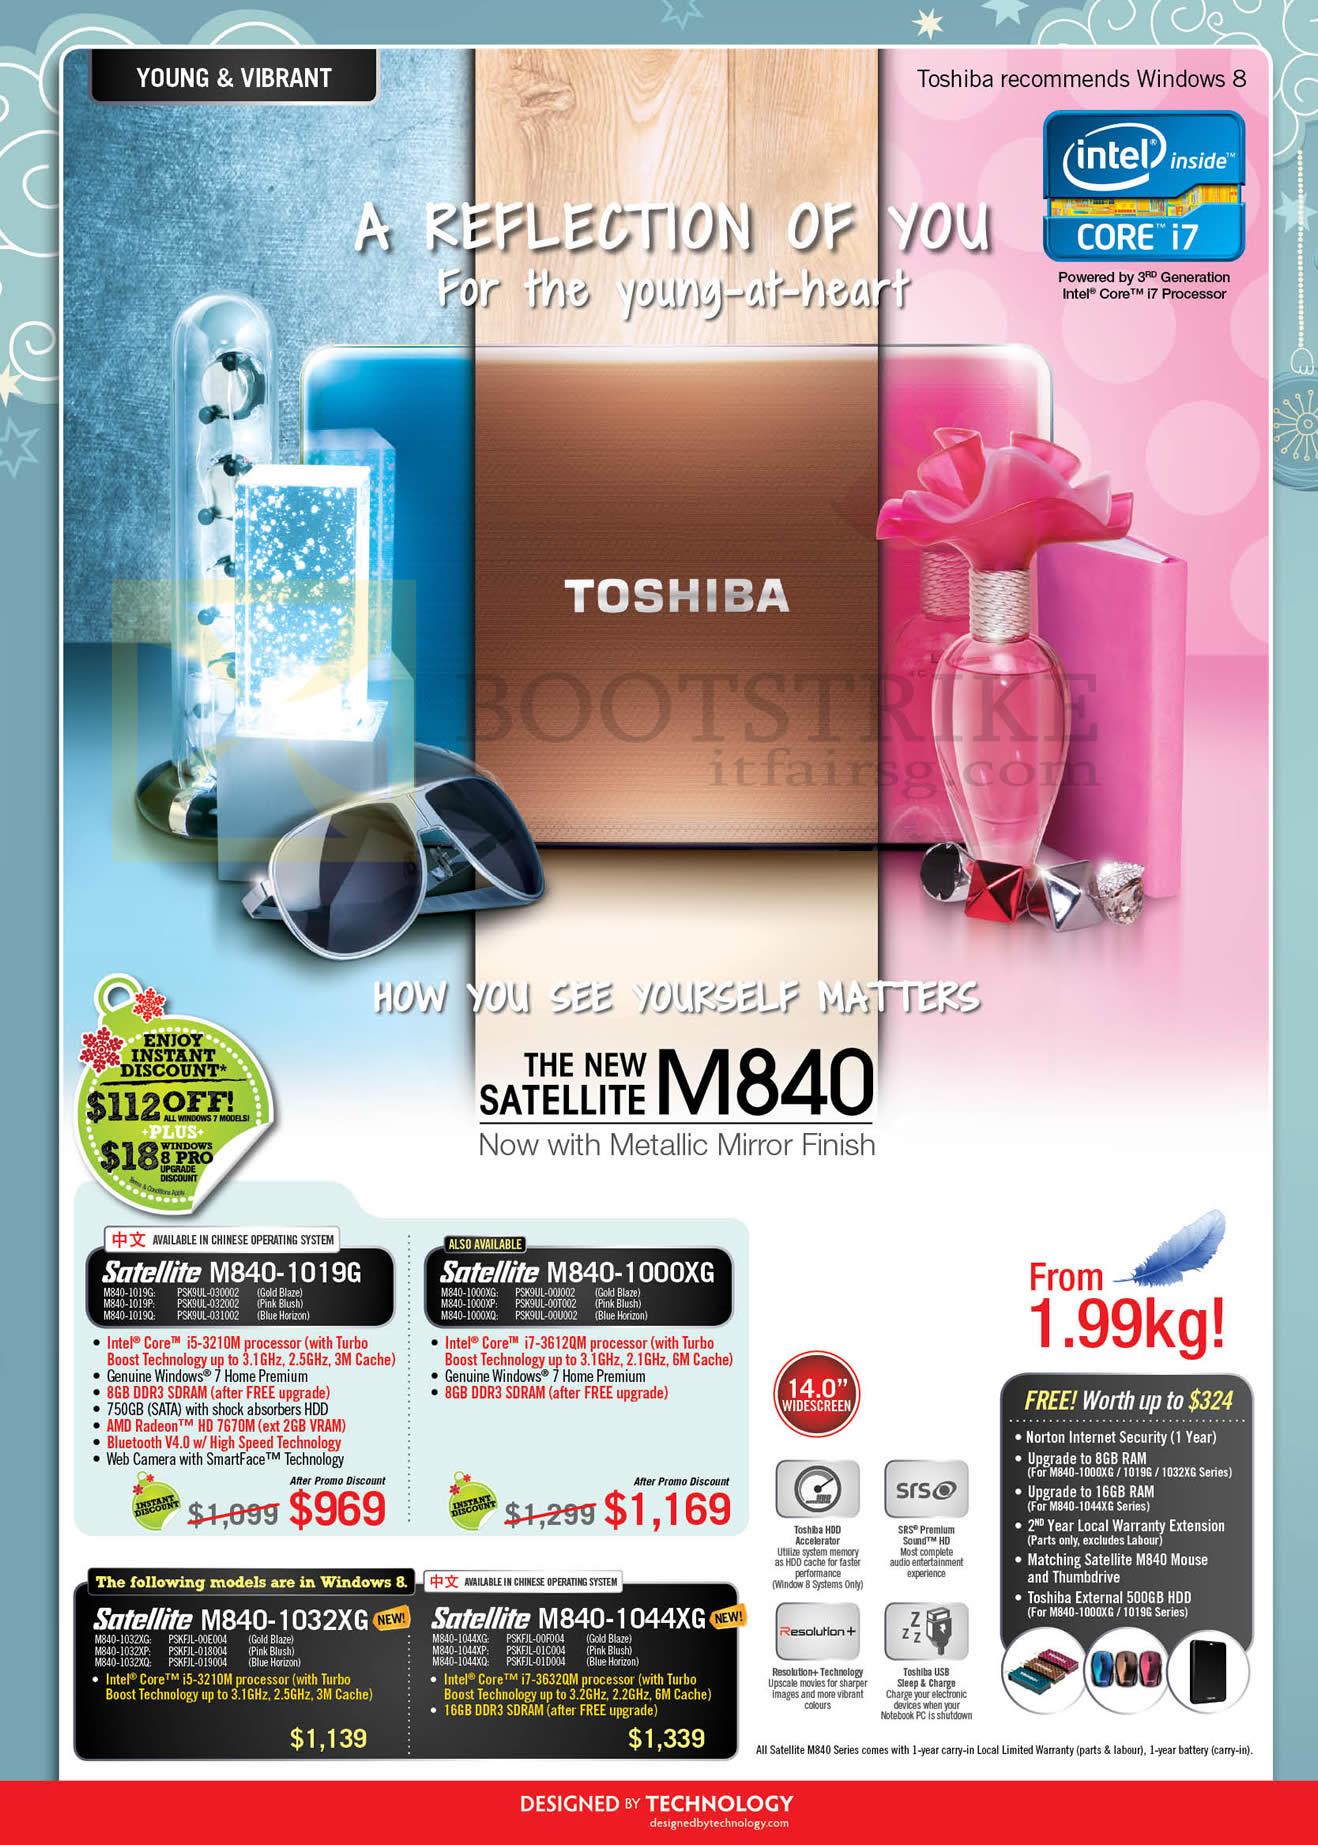 SITEX 2012 price list image brochure of Toshiba Notebooks Satellite M84-1019G, M840-1000XG, M840-1032XG, M840-1044XG